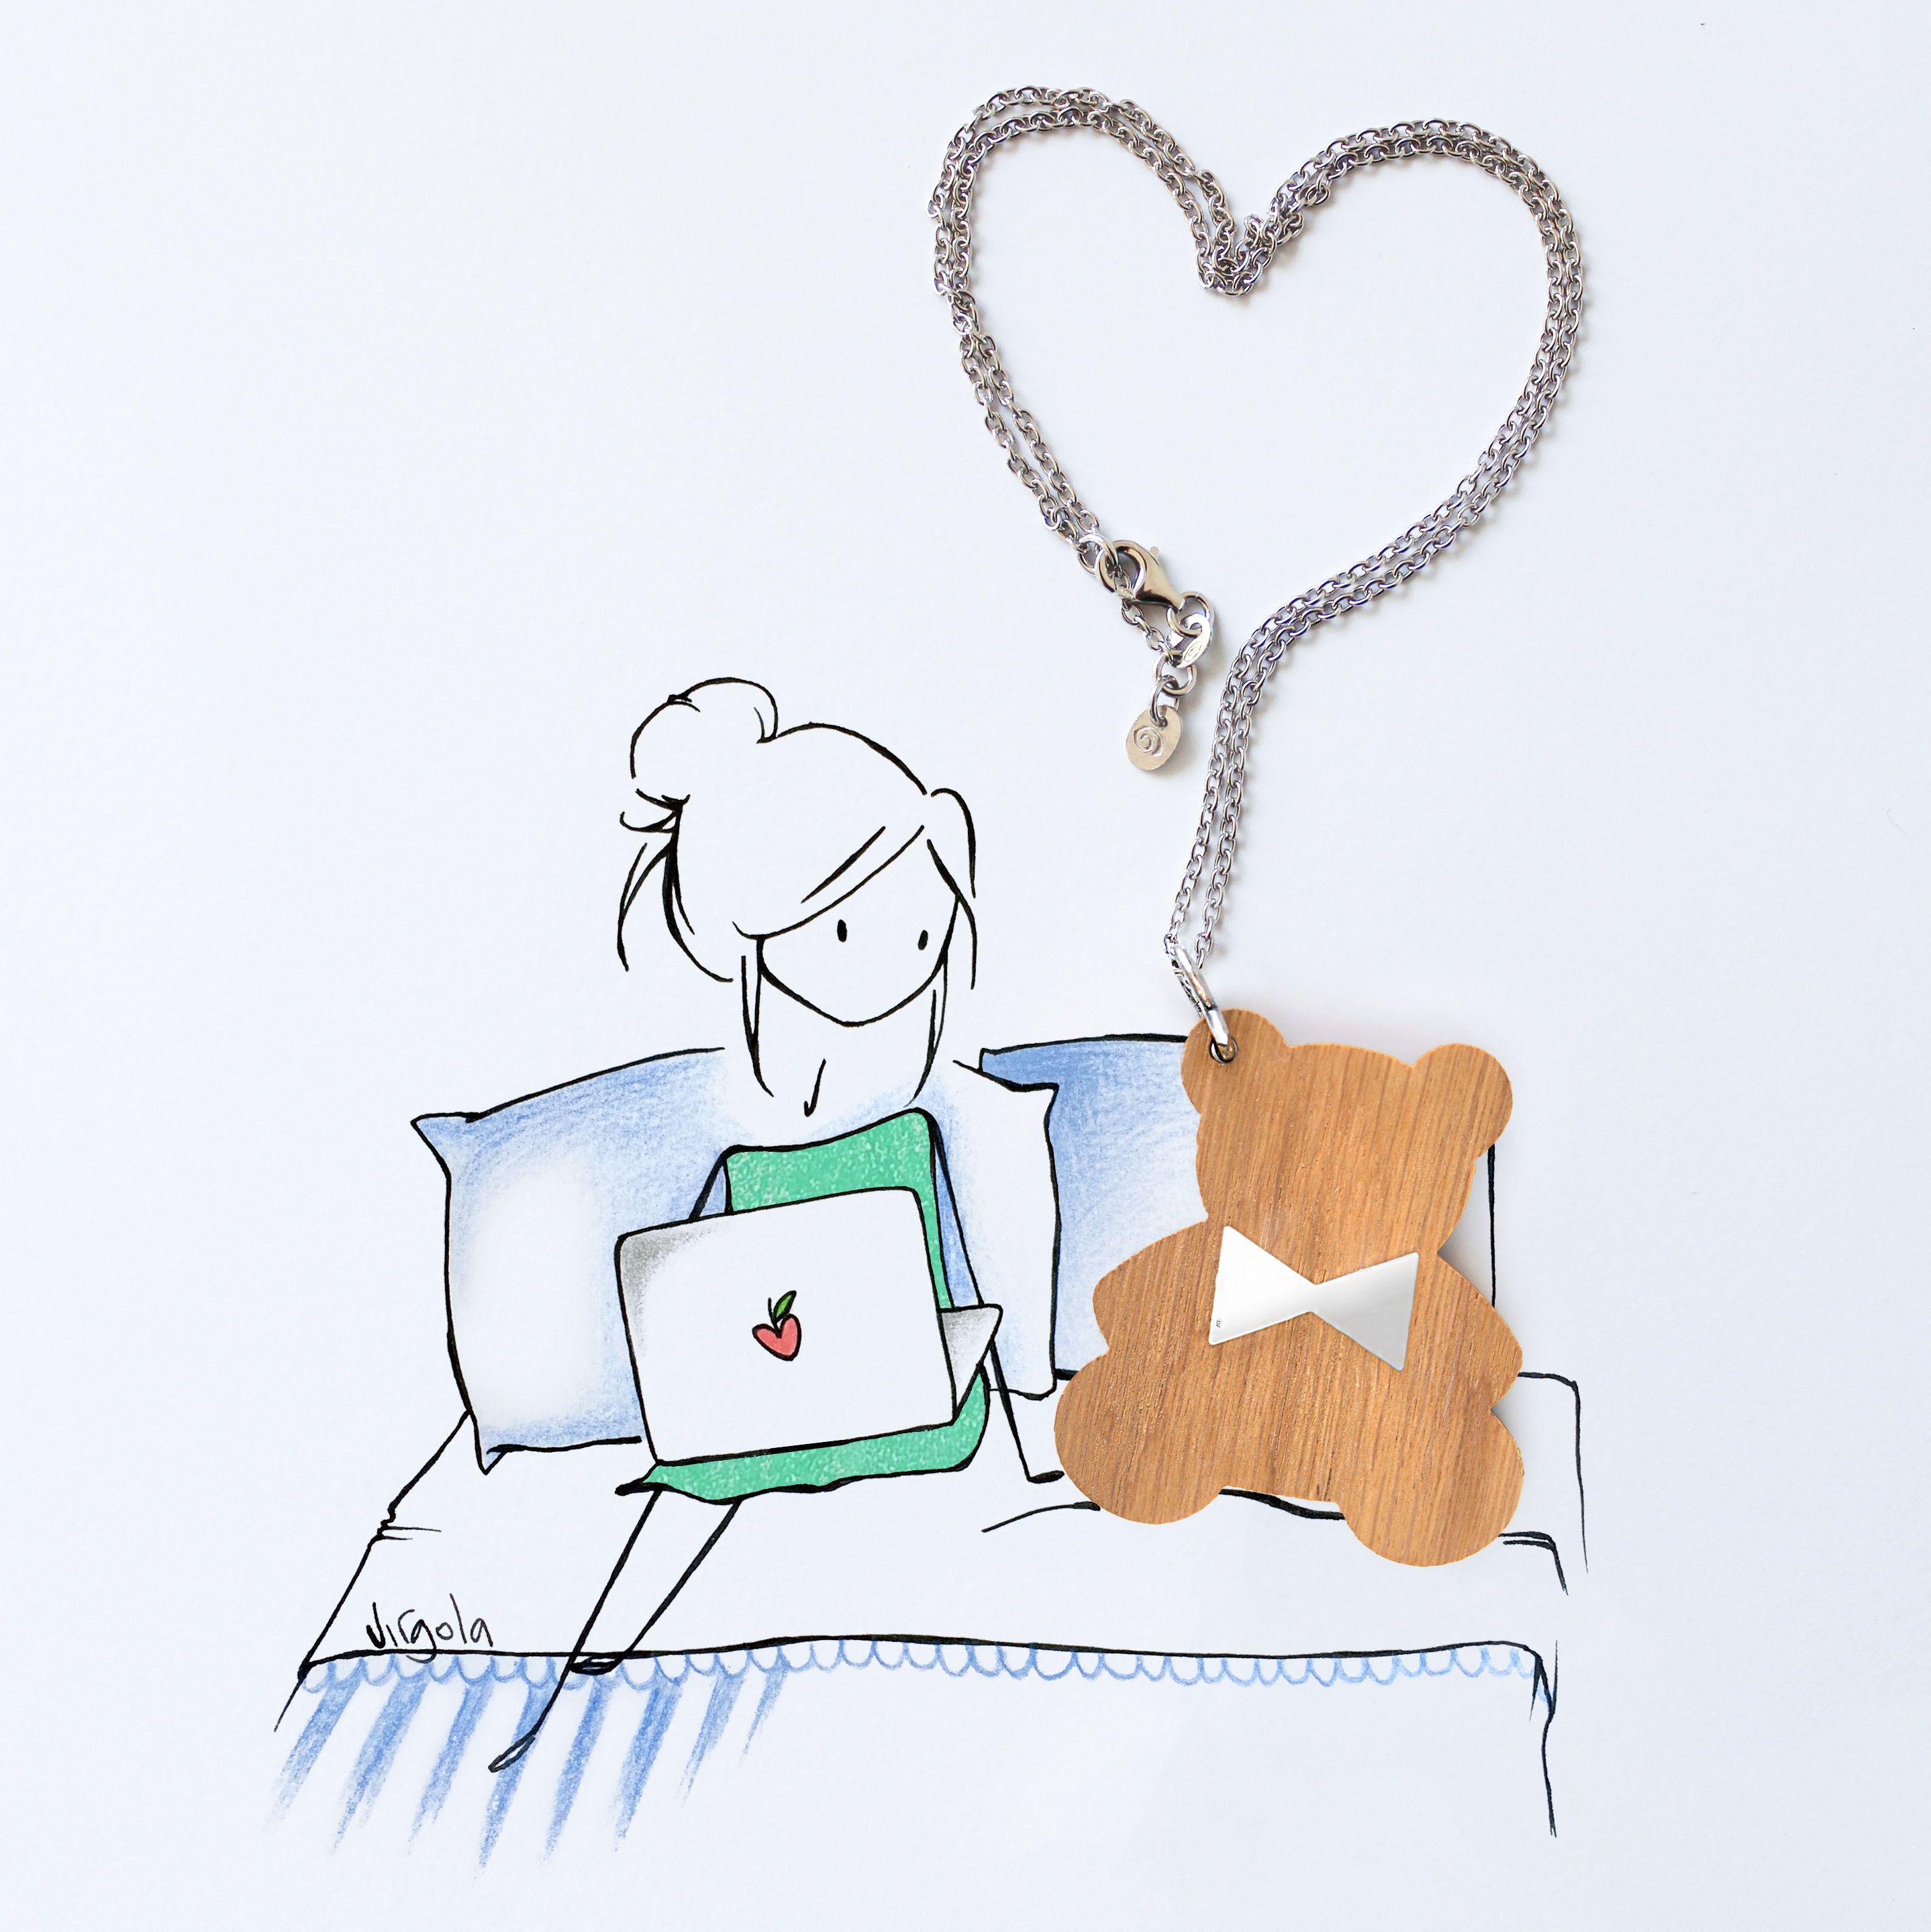 Virgola | Il diario di Virgola, vita da illustratrice | my ownn ...